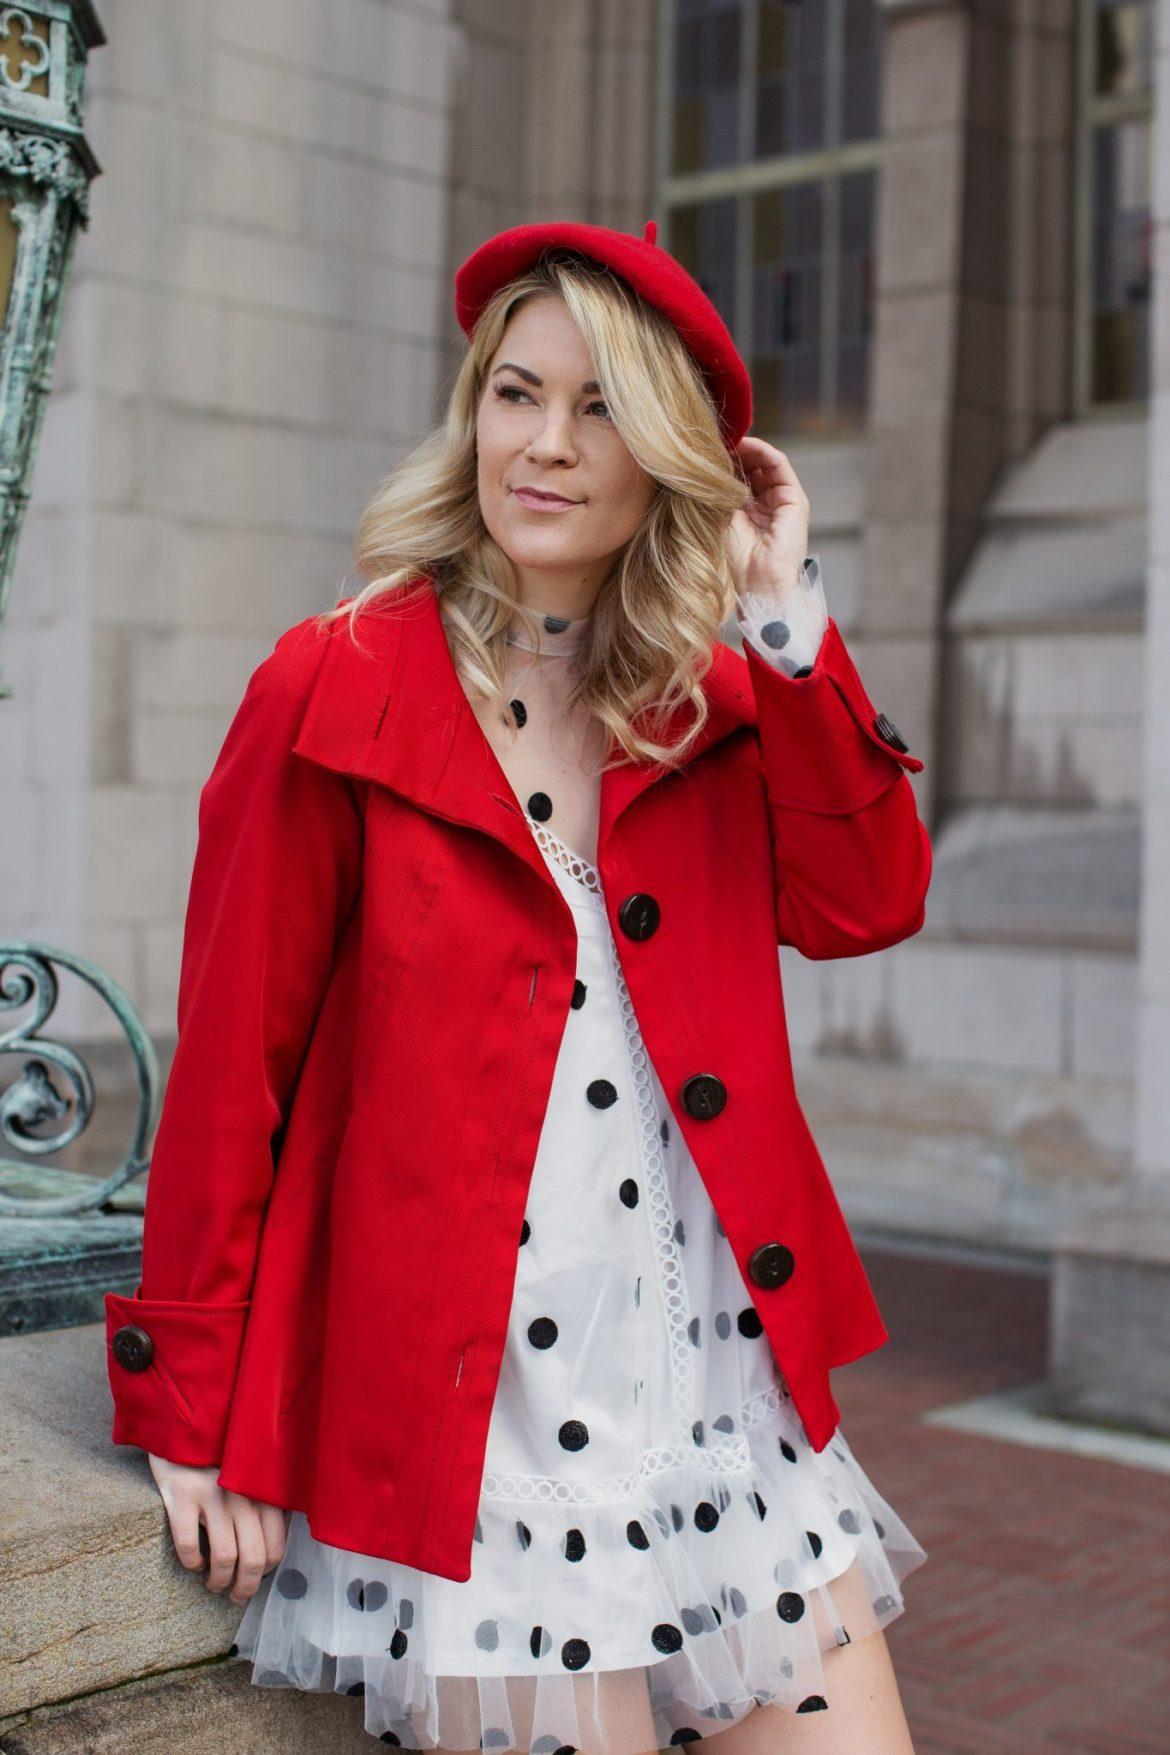 polka dot dress red beret